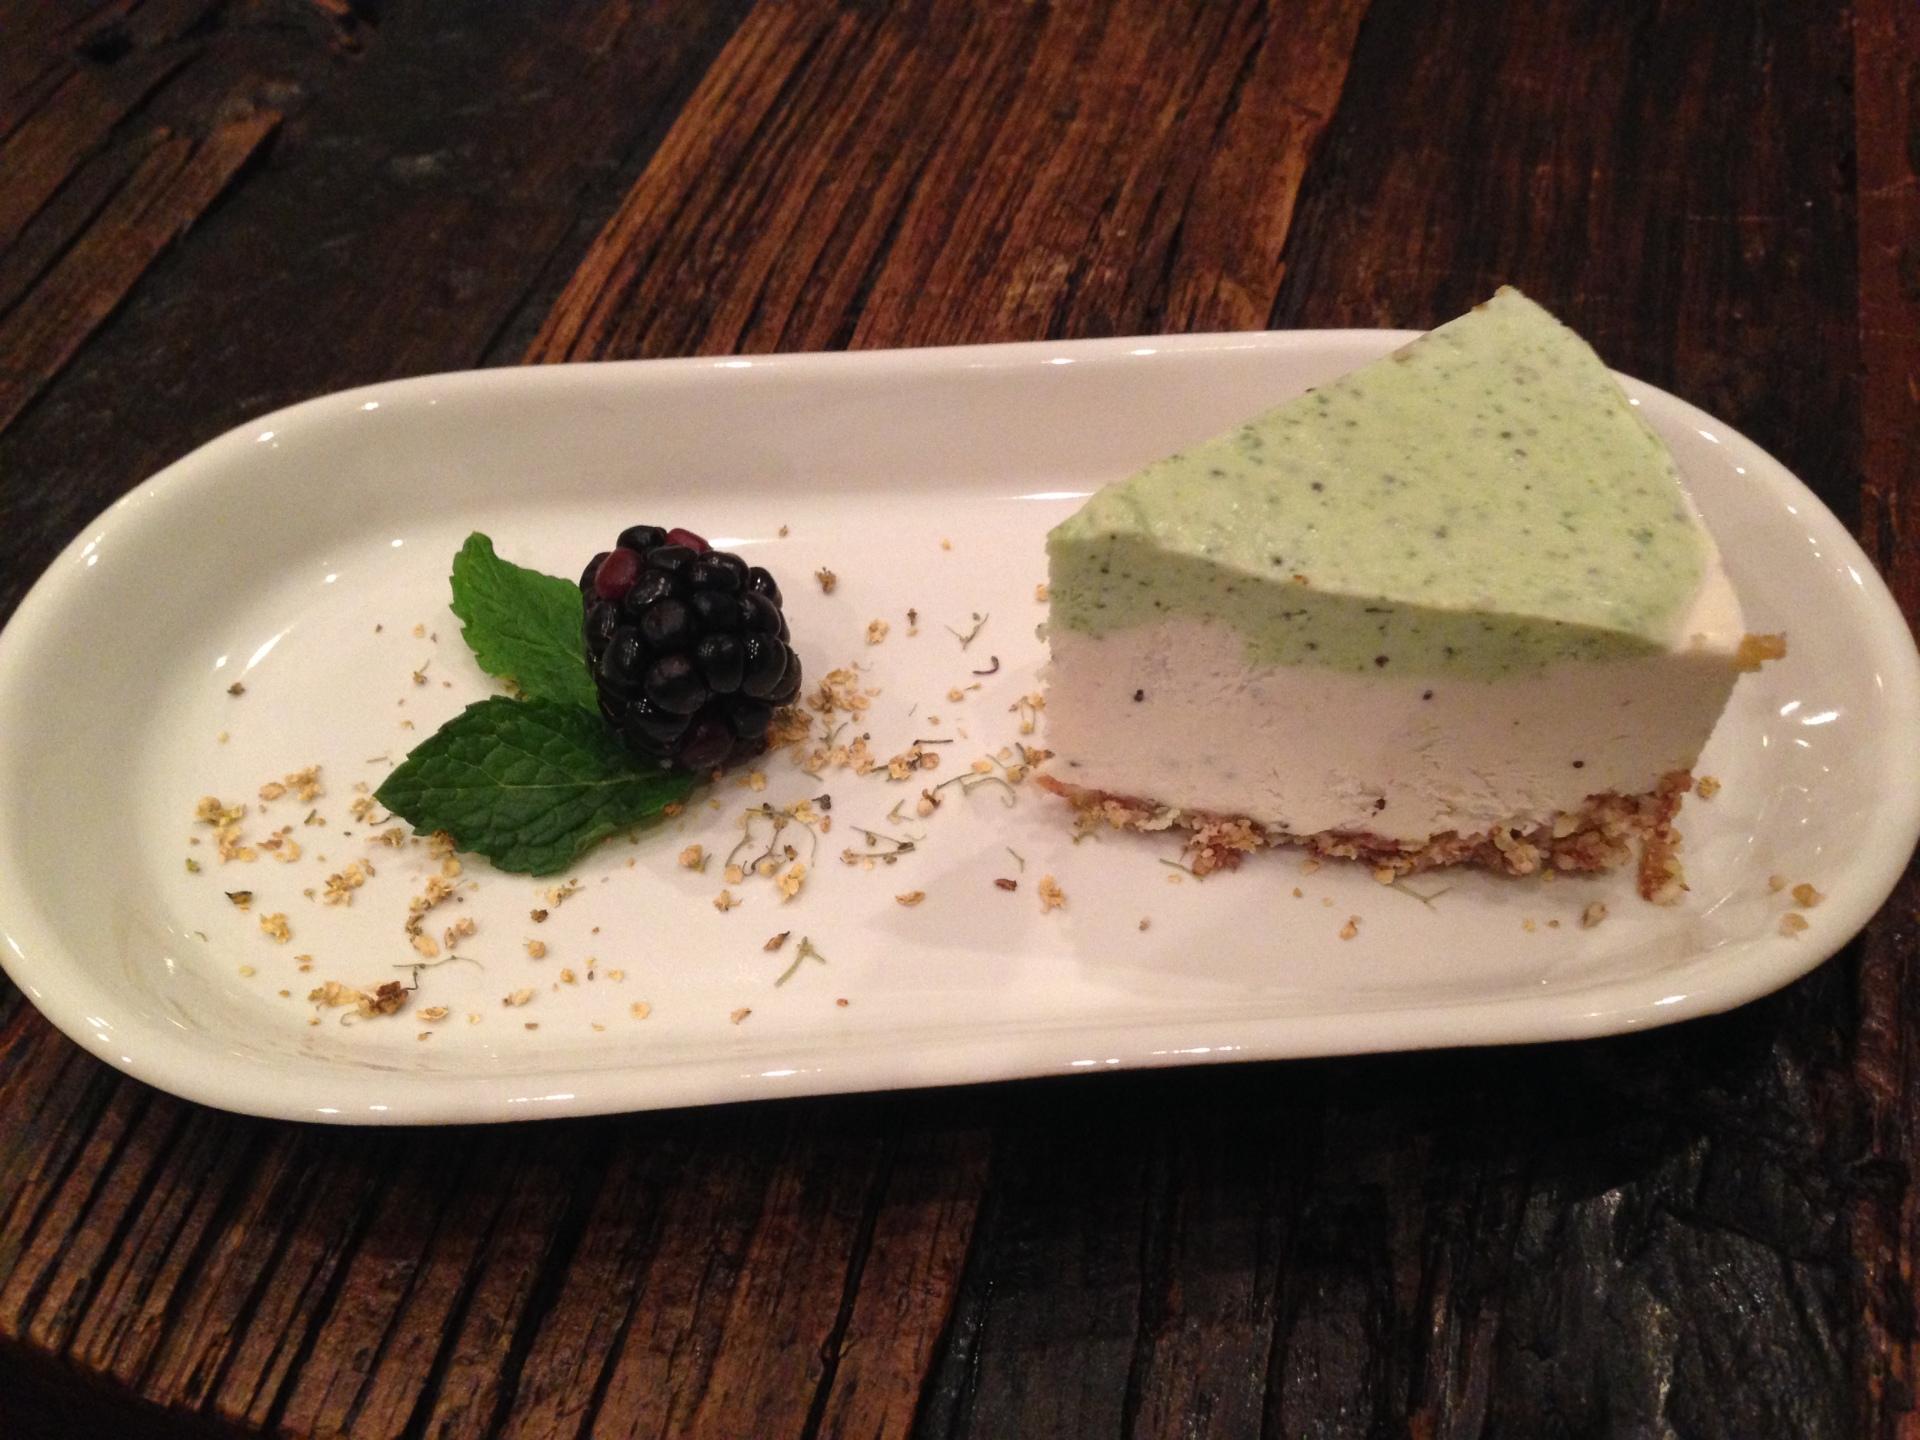 Desserts, Treats and Snacks